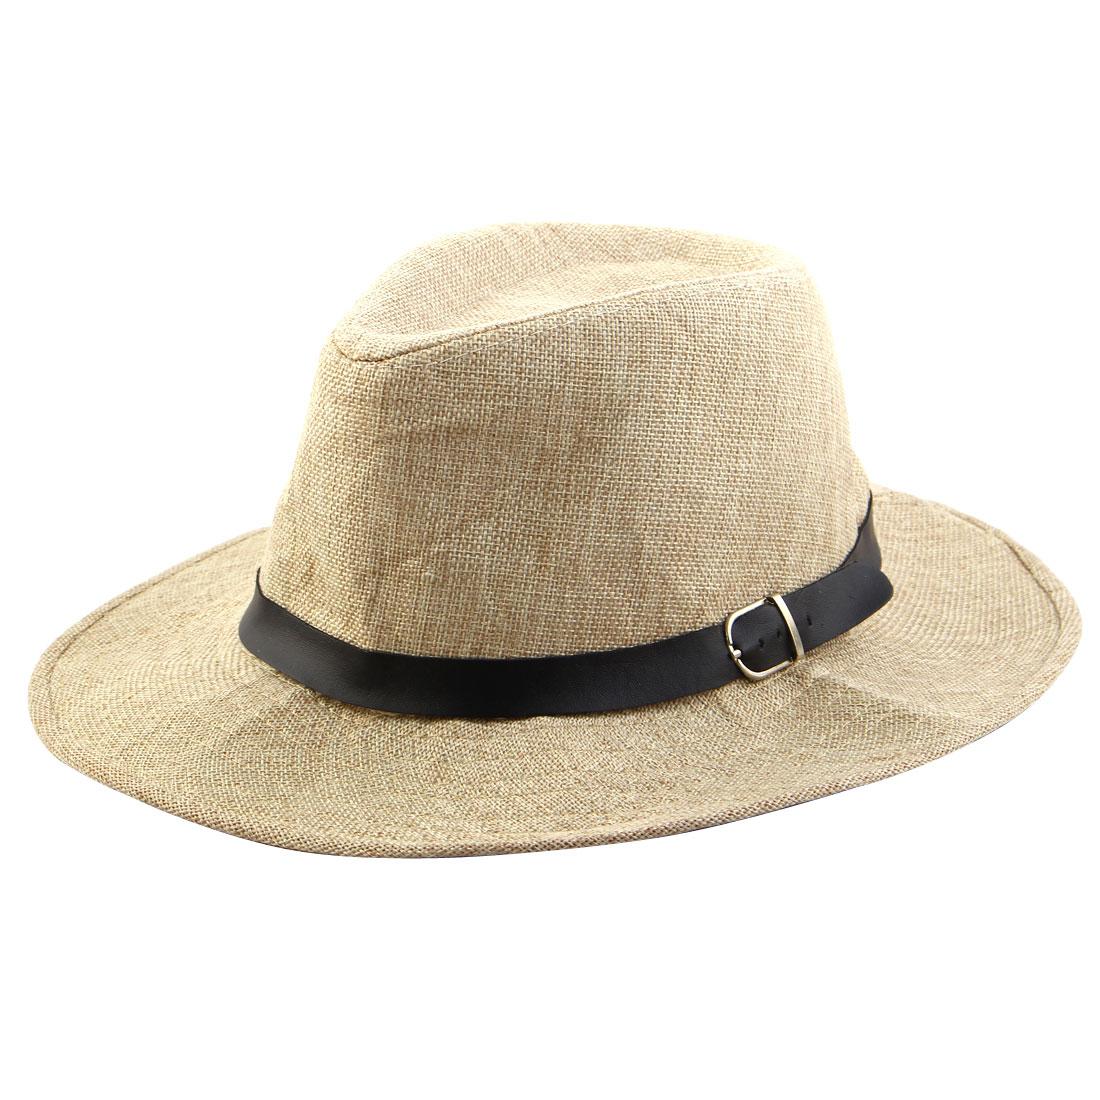 Men Summer Outdoor Linen Wide Brim Western Style Beach Sunhat Cowboy Hat Beige